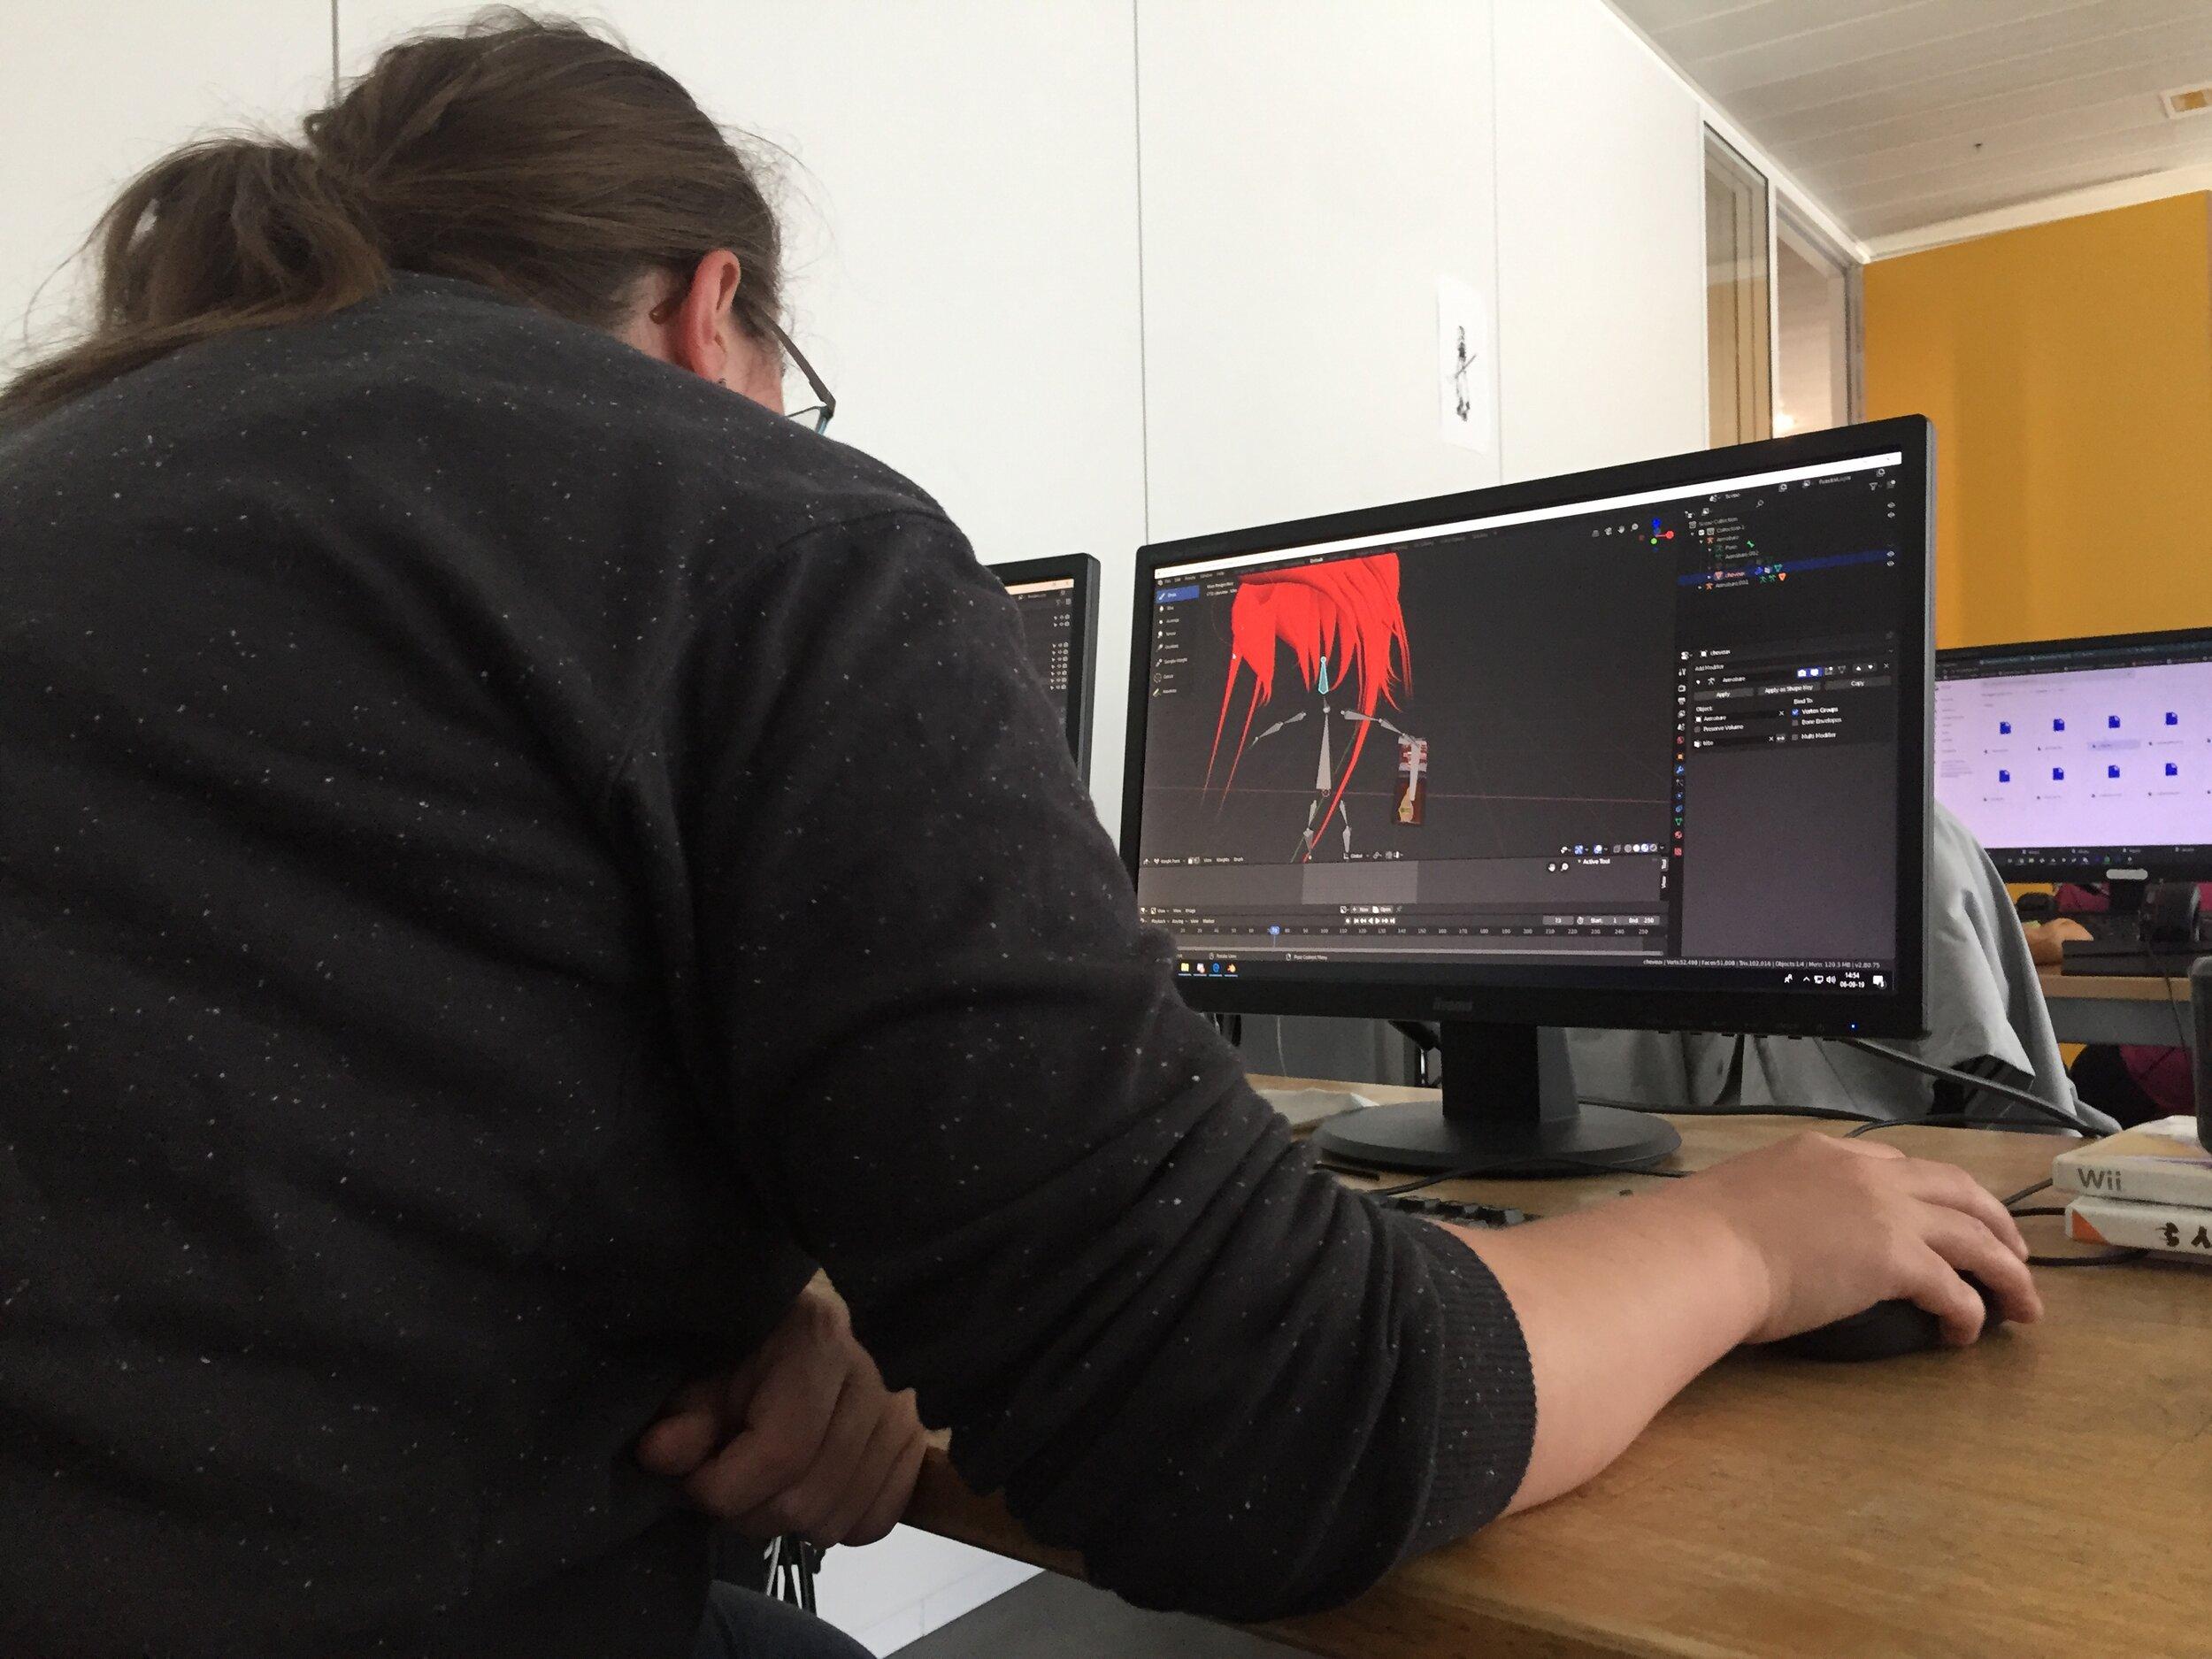 Interface3-2019-Gamedevelopment-VR-7.jpeg